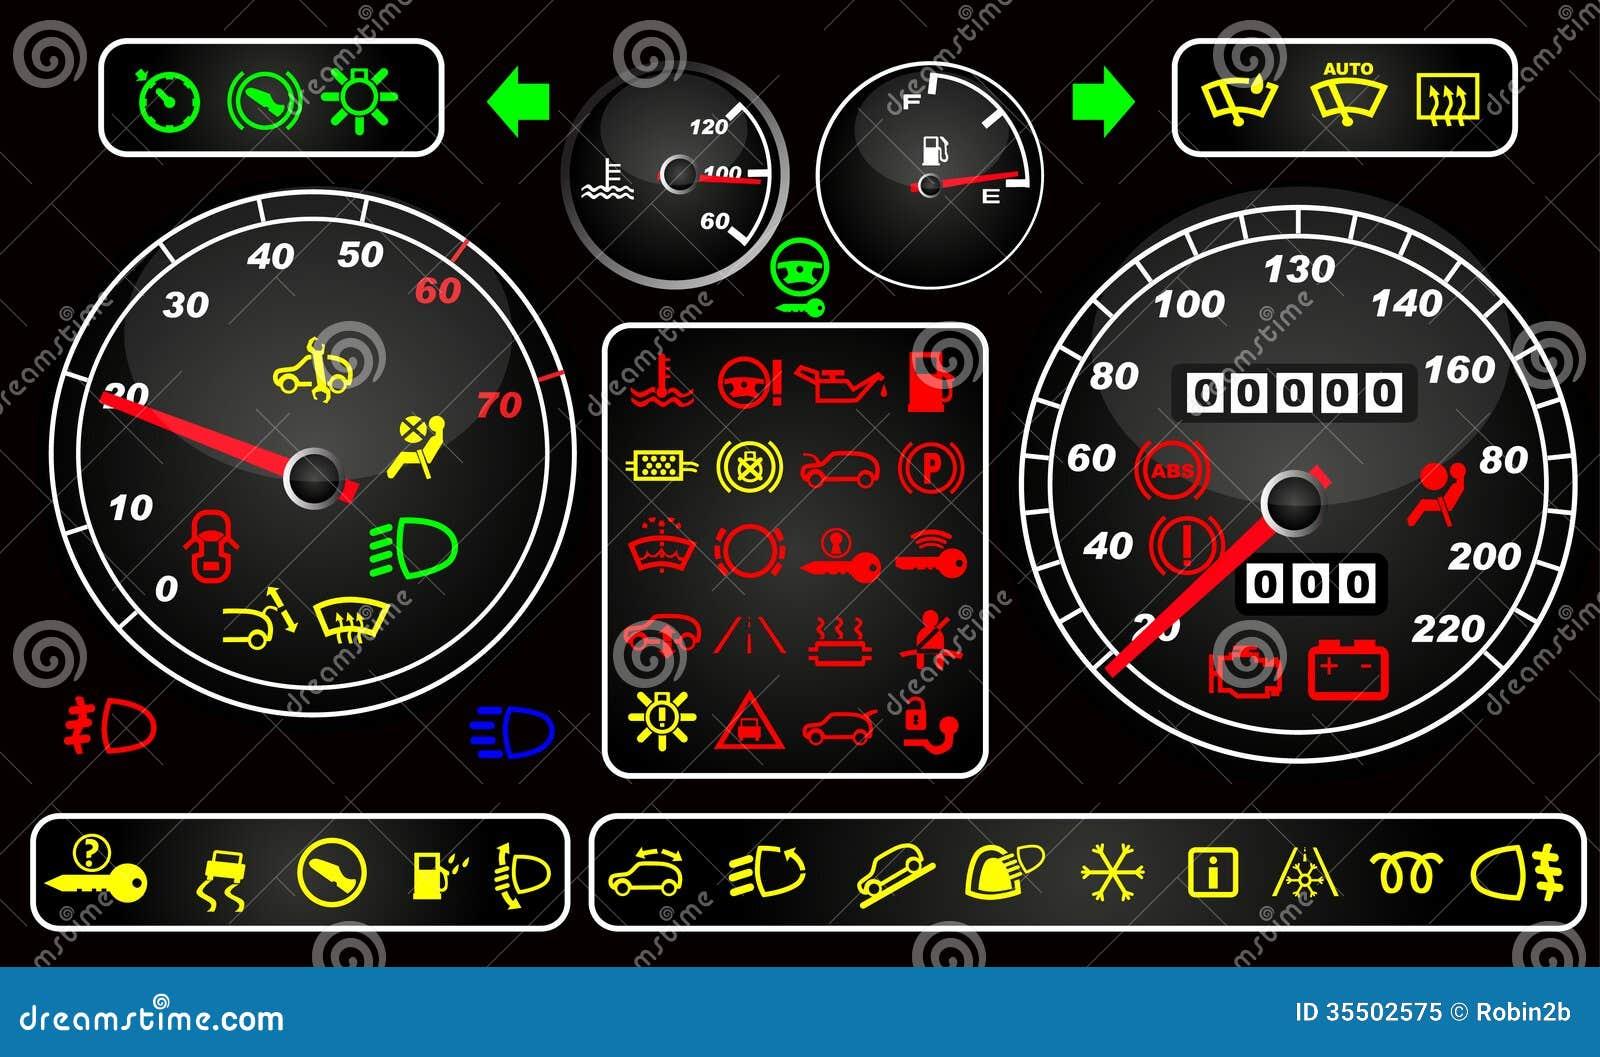 Bmw Series Dashboard Warning Lights Carburetor Gallery - Bmw 1 series dashboard signs